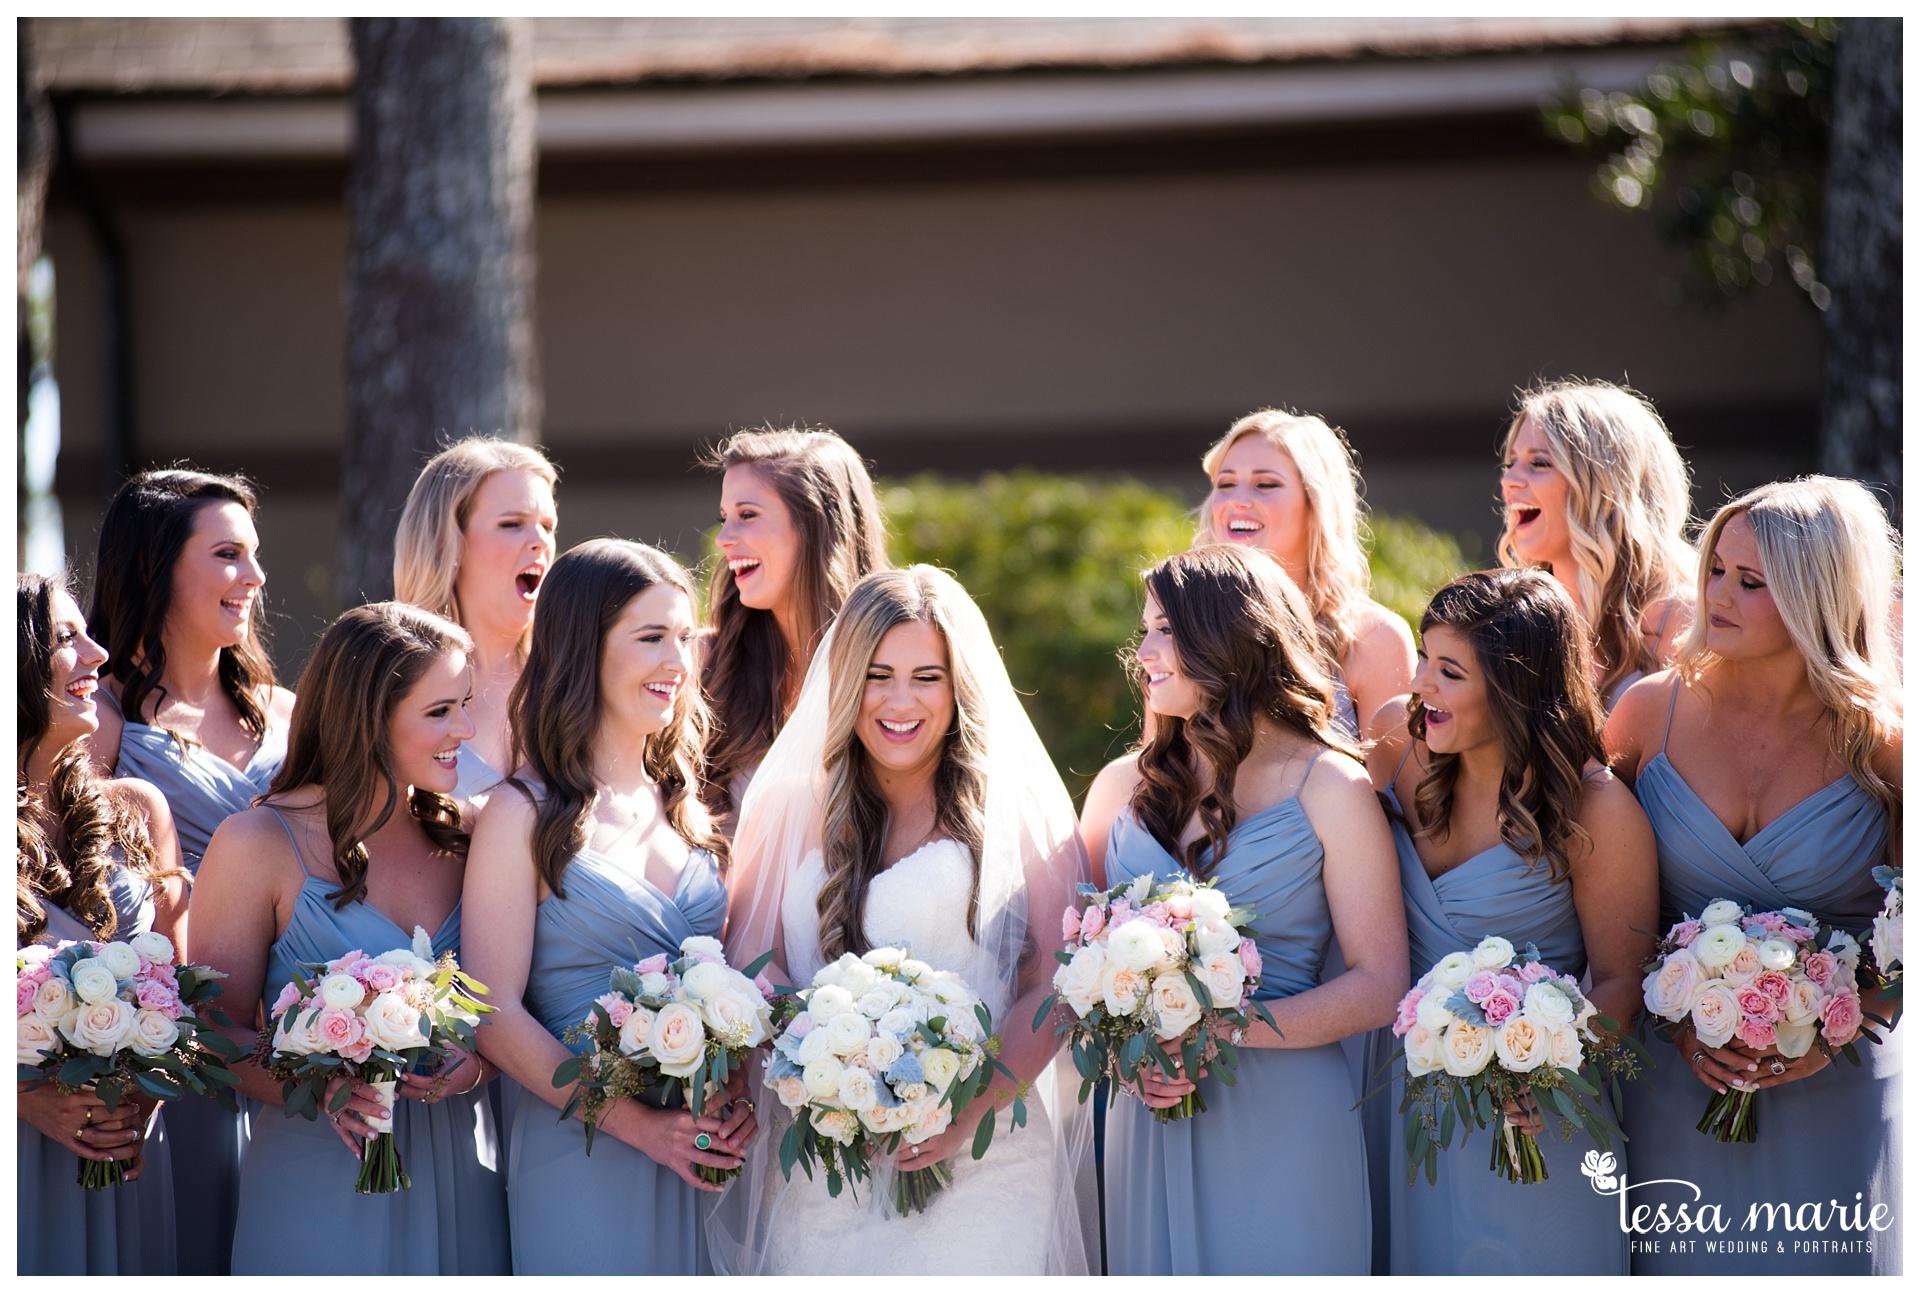 tessa_marie_weddings_legacy_story_focused_wedding_pictures_atlanta_wedding_photographer_0146